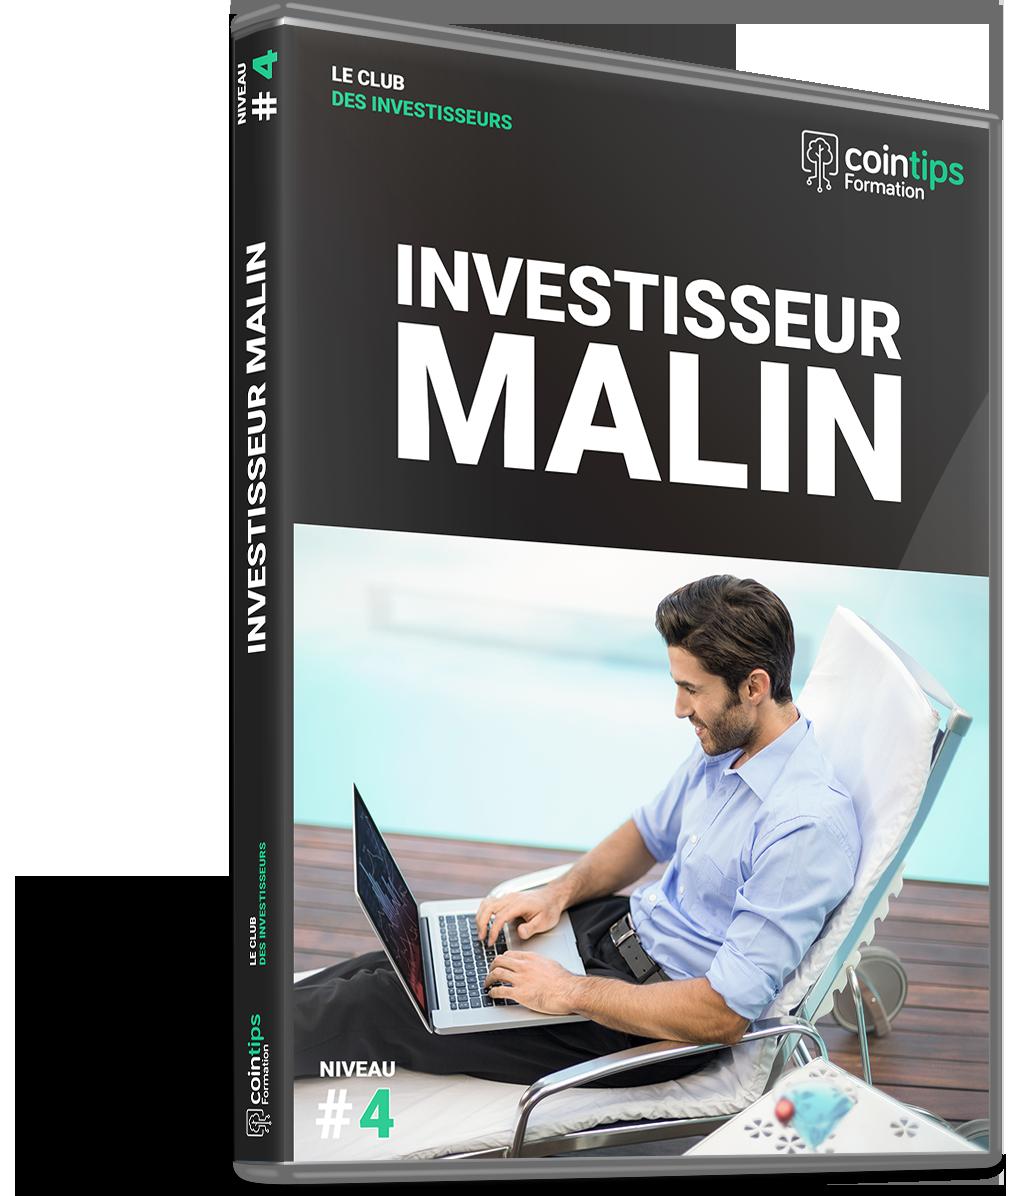 CLUB'INVEST - Investisseur Malin